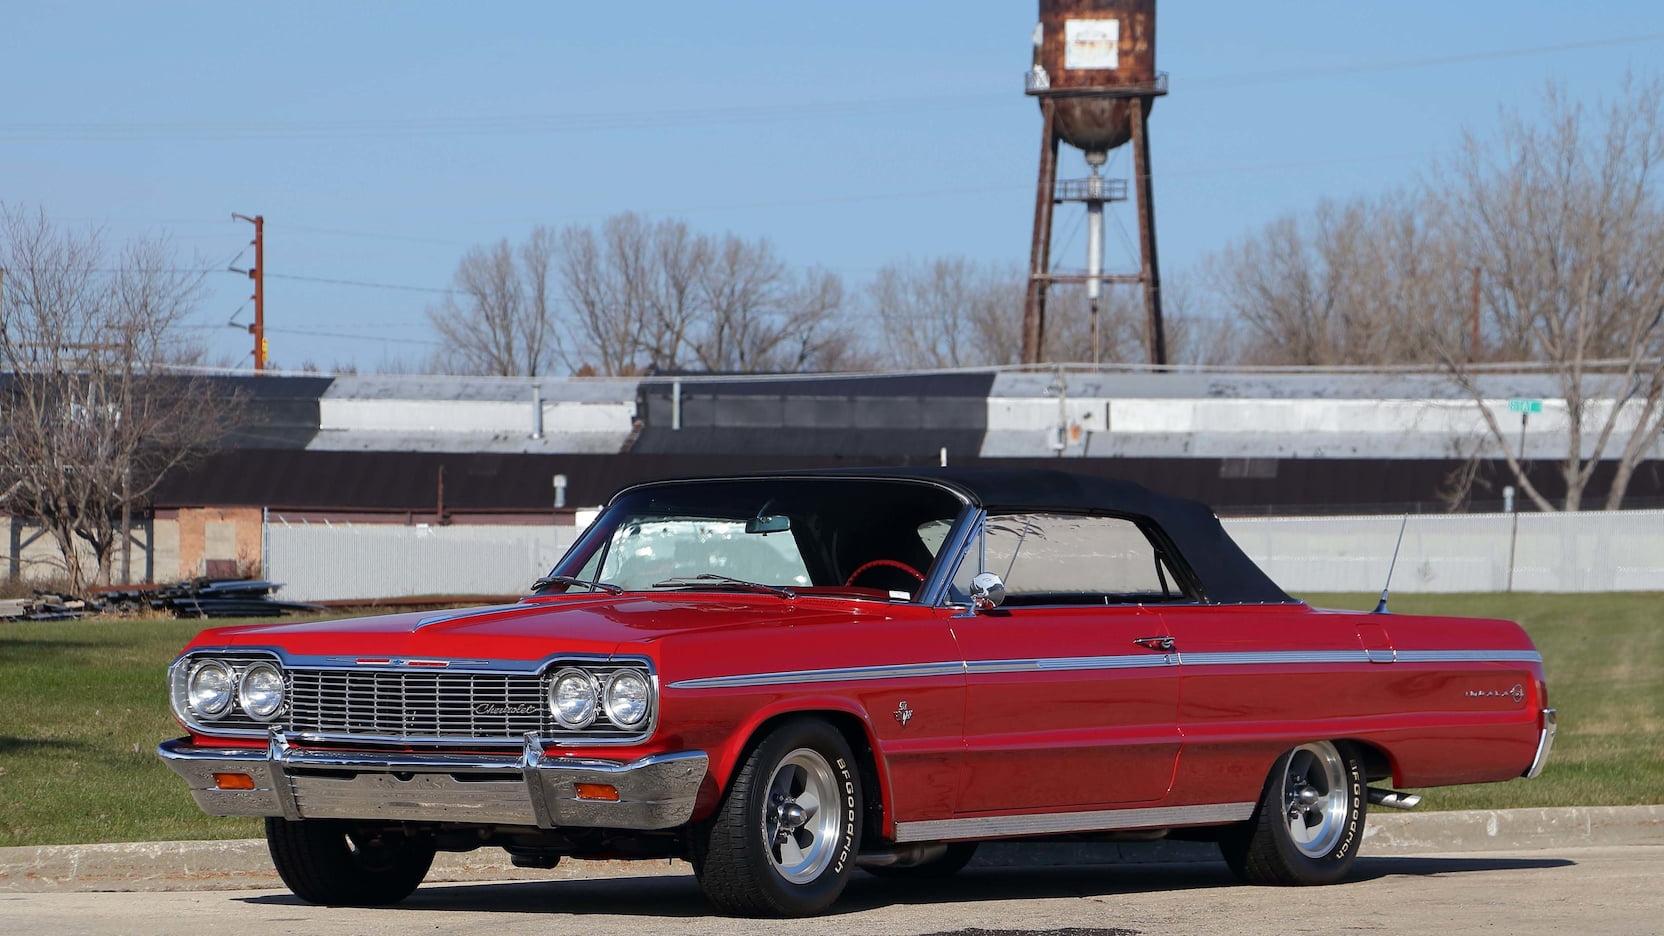 1964 Chevrolet Impala front 3/4